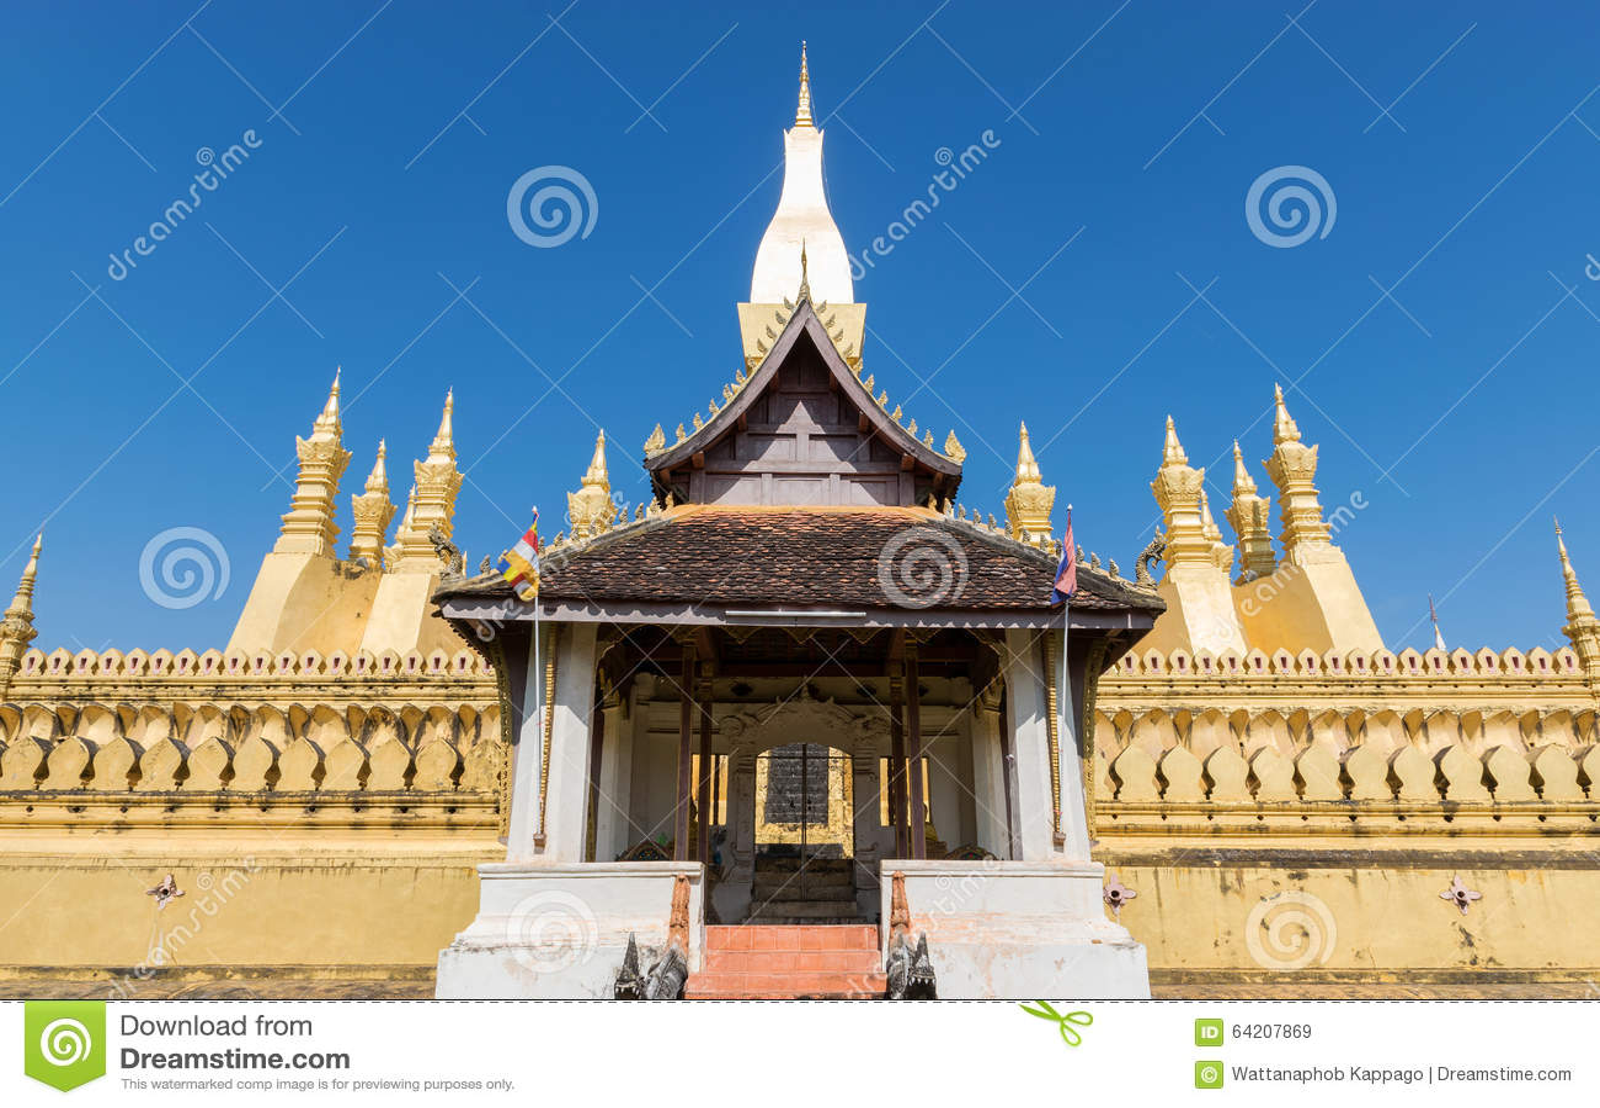 Pha que Luang